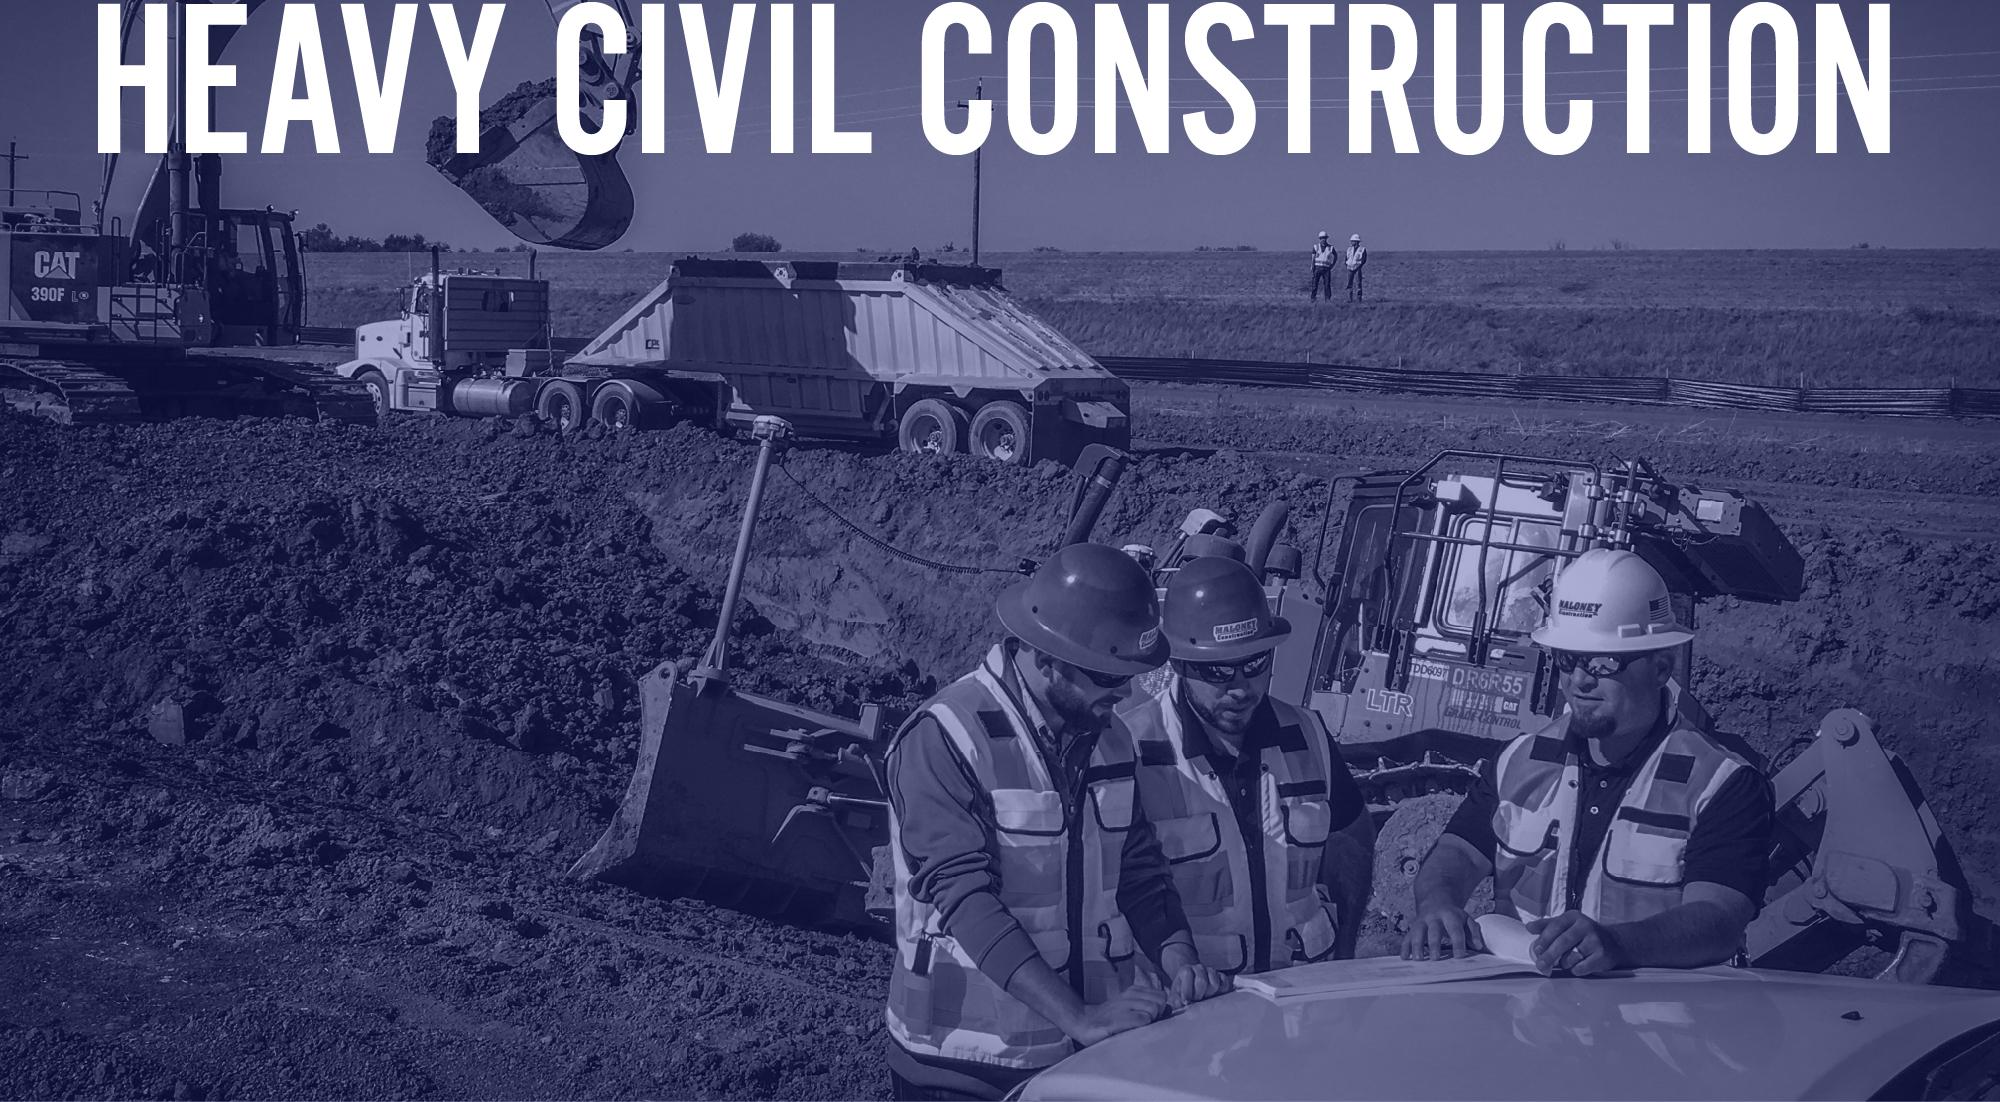 levee construction natomas basin heavy civil